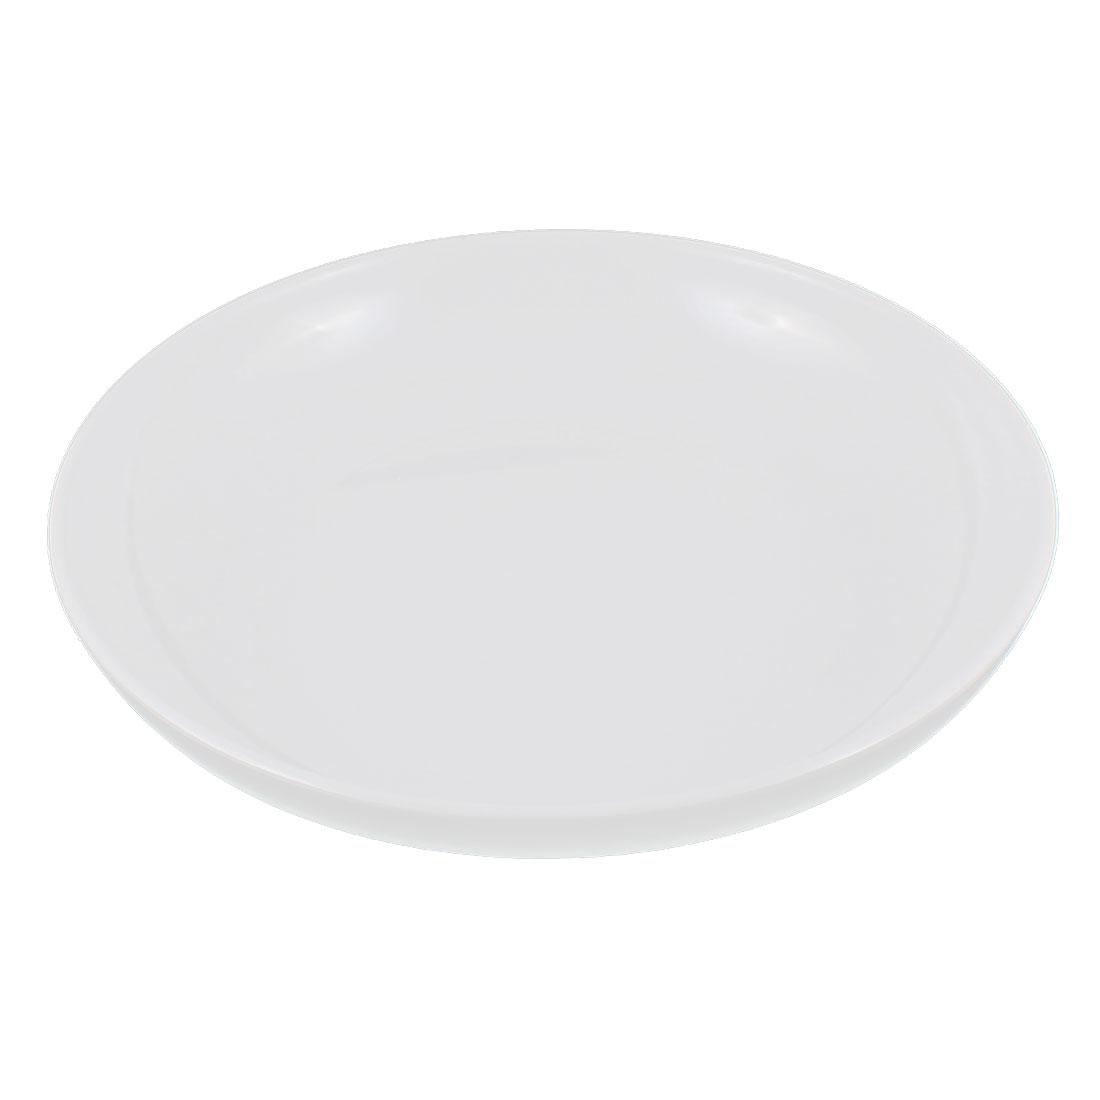 Kitchen Dinnerware Round Shape Dish Food Container Plate 25cm Dia